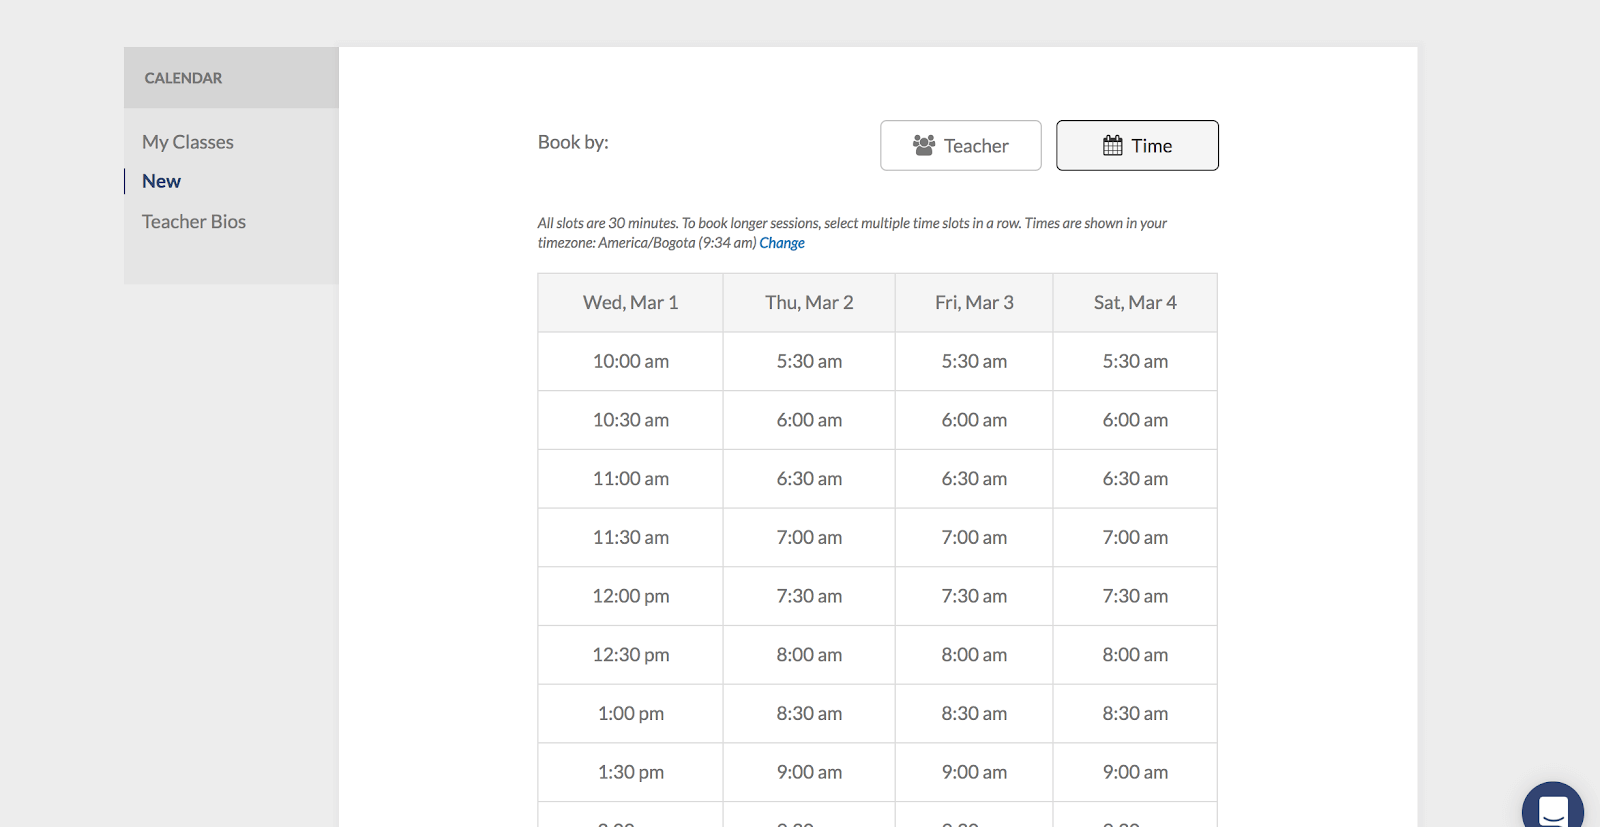 BaseLang - Scheduling